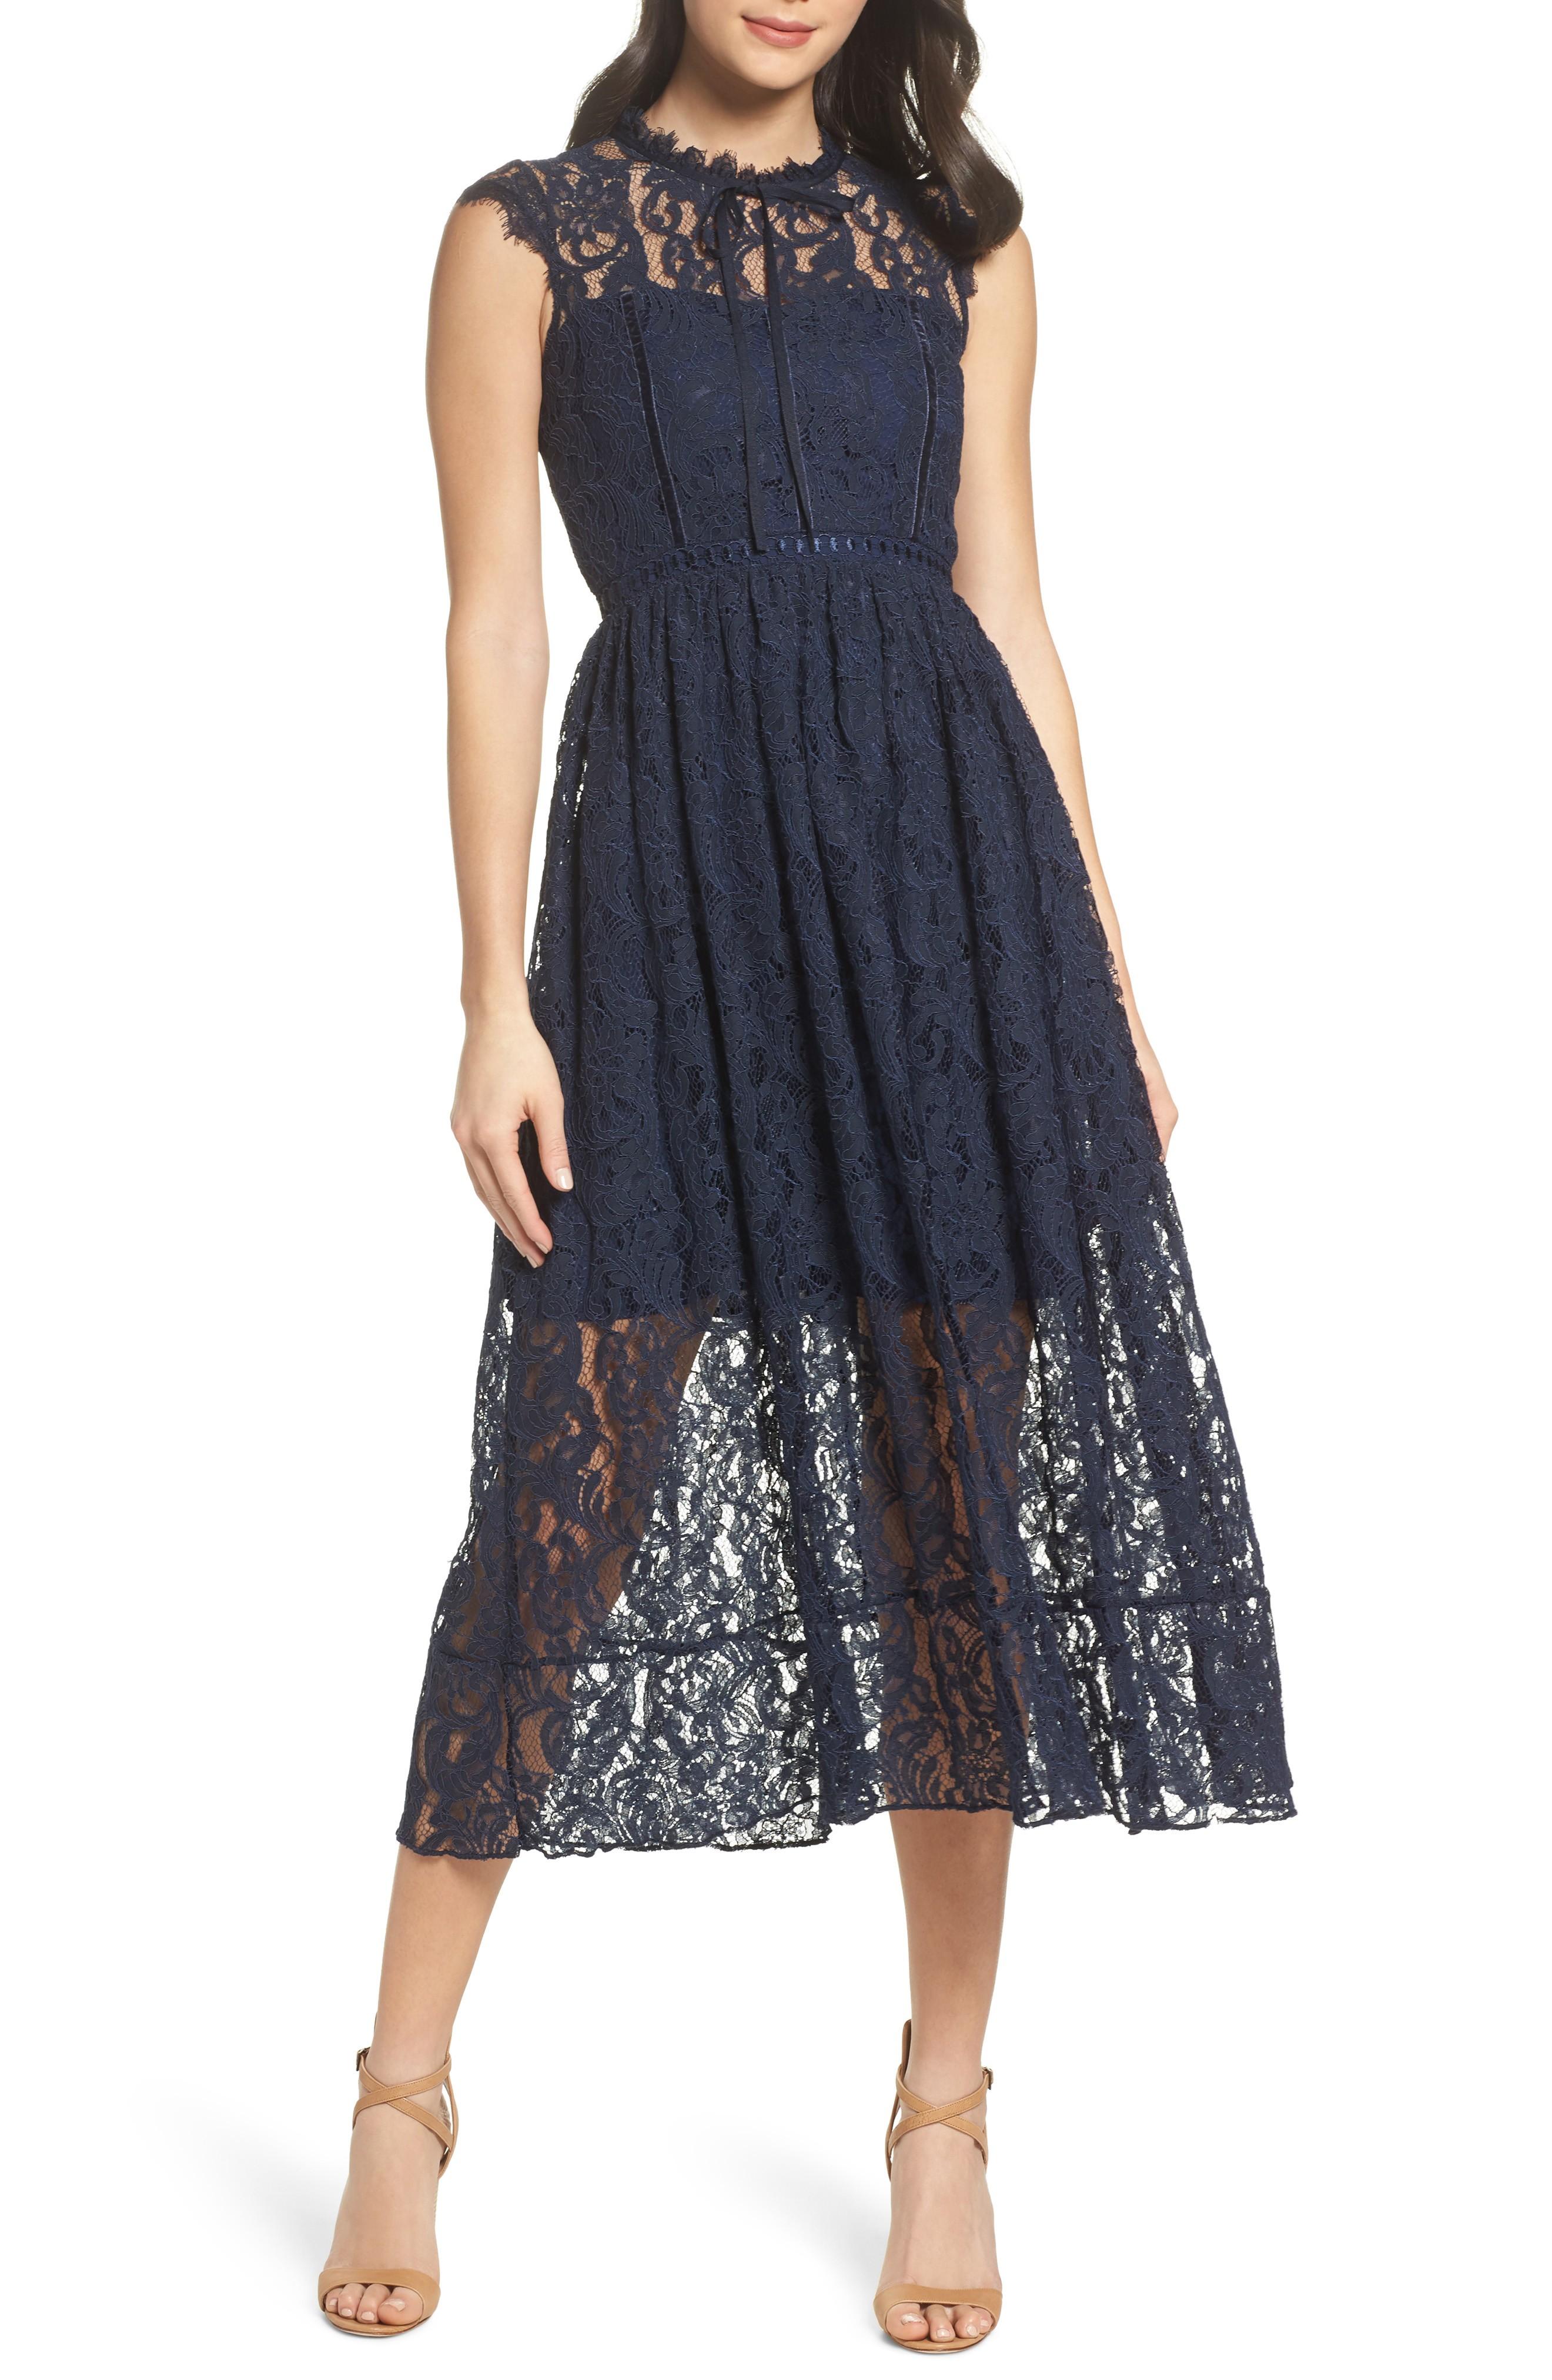 e1f8586991 CHELSEA28 Lace Midi Navy Blue Dress - We Select Dresses